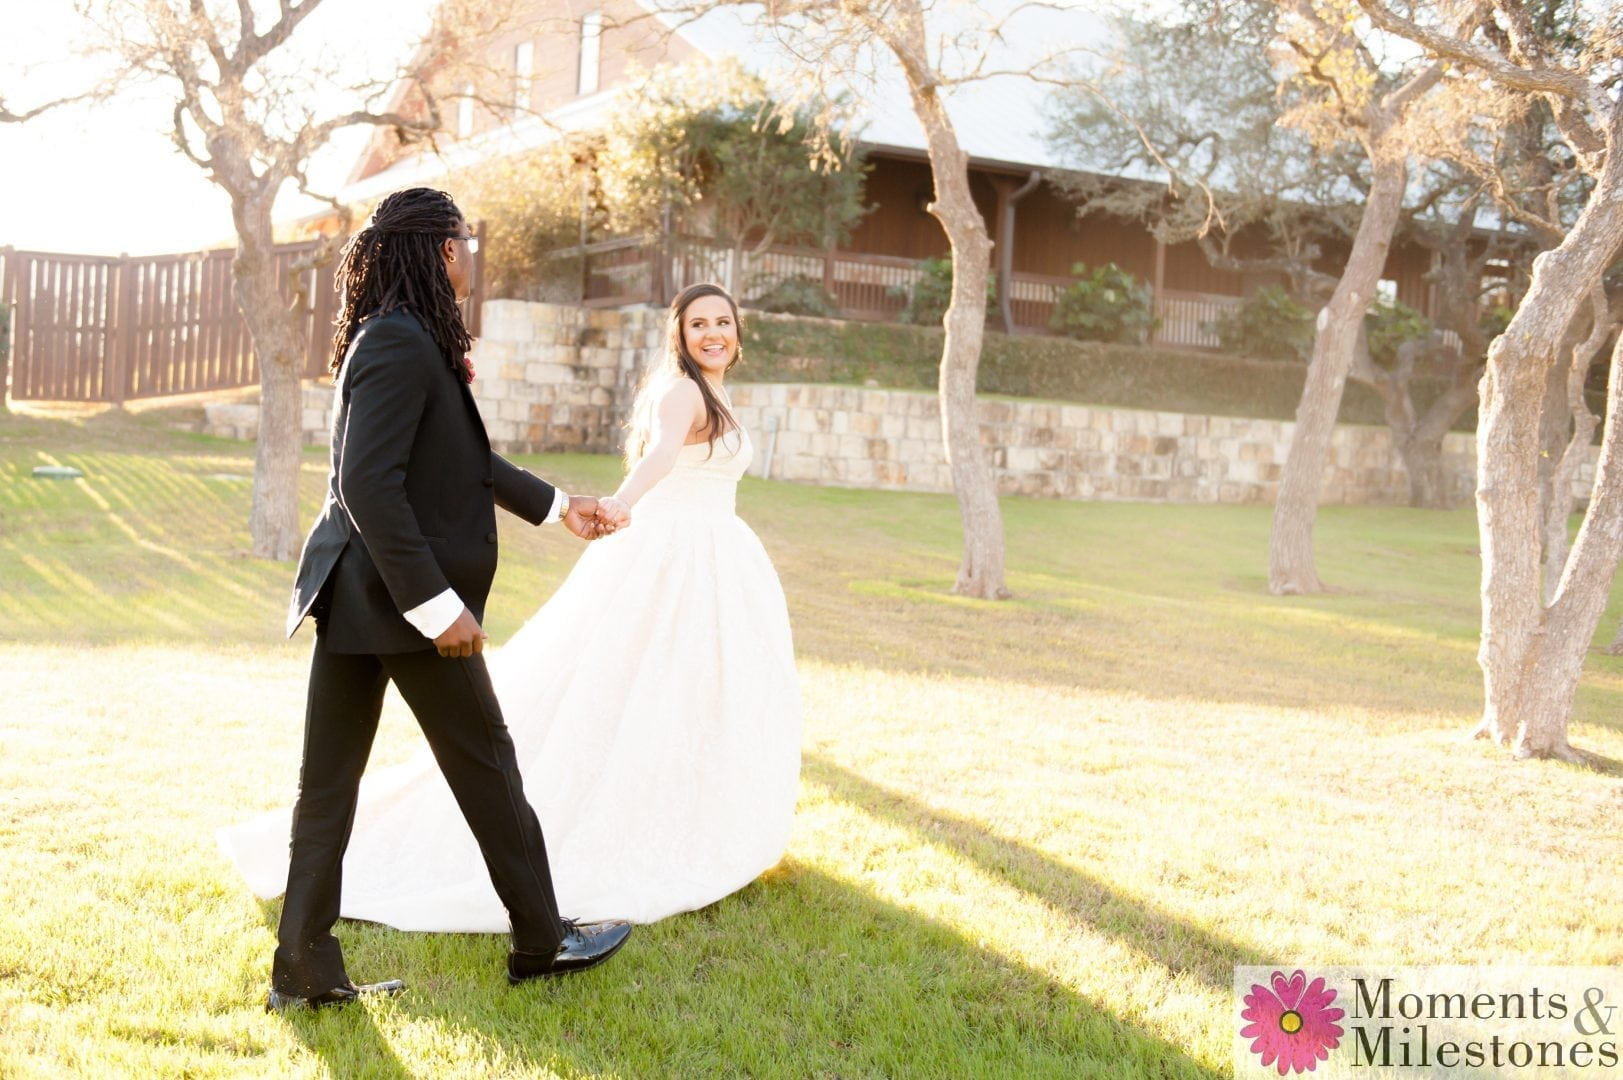 San Antonio New Braunfels Springs Event Center Dream Wedding Planning Wedding Photography